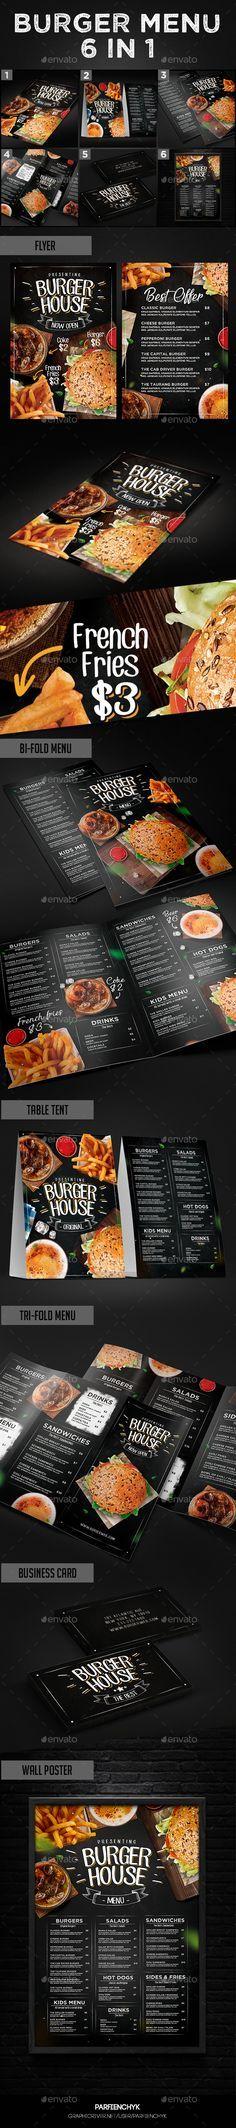 Burger Menu Set — Photoshop PSD #grill #hipster • Download ➝ https://graphicriver.net/item/burger-menu-set/19746741?ref=pxcr